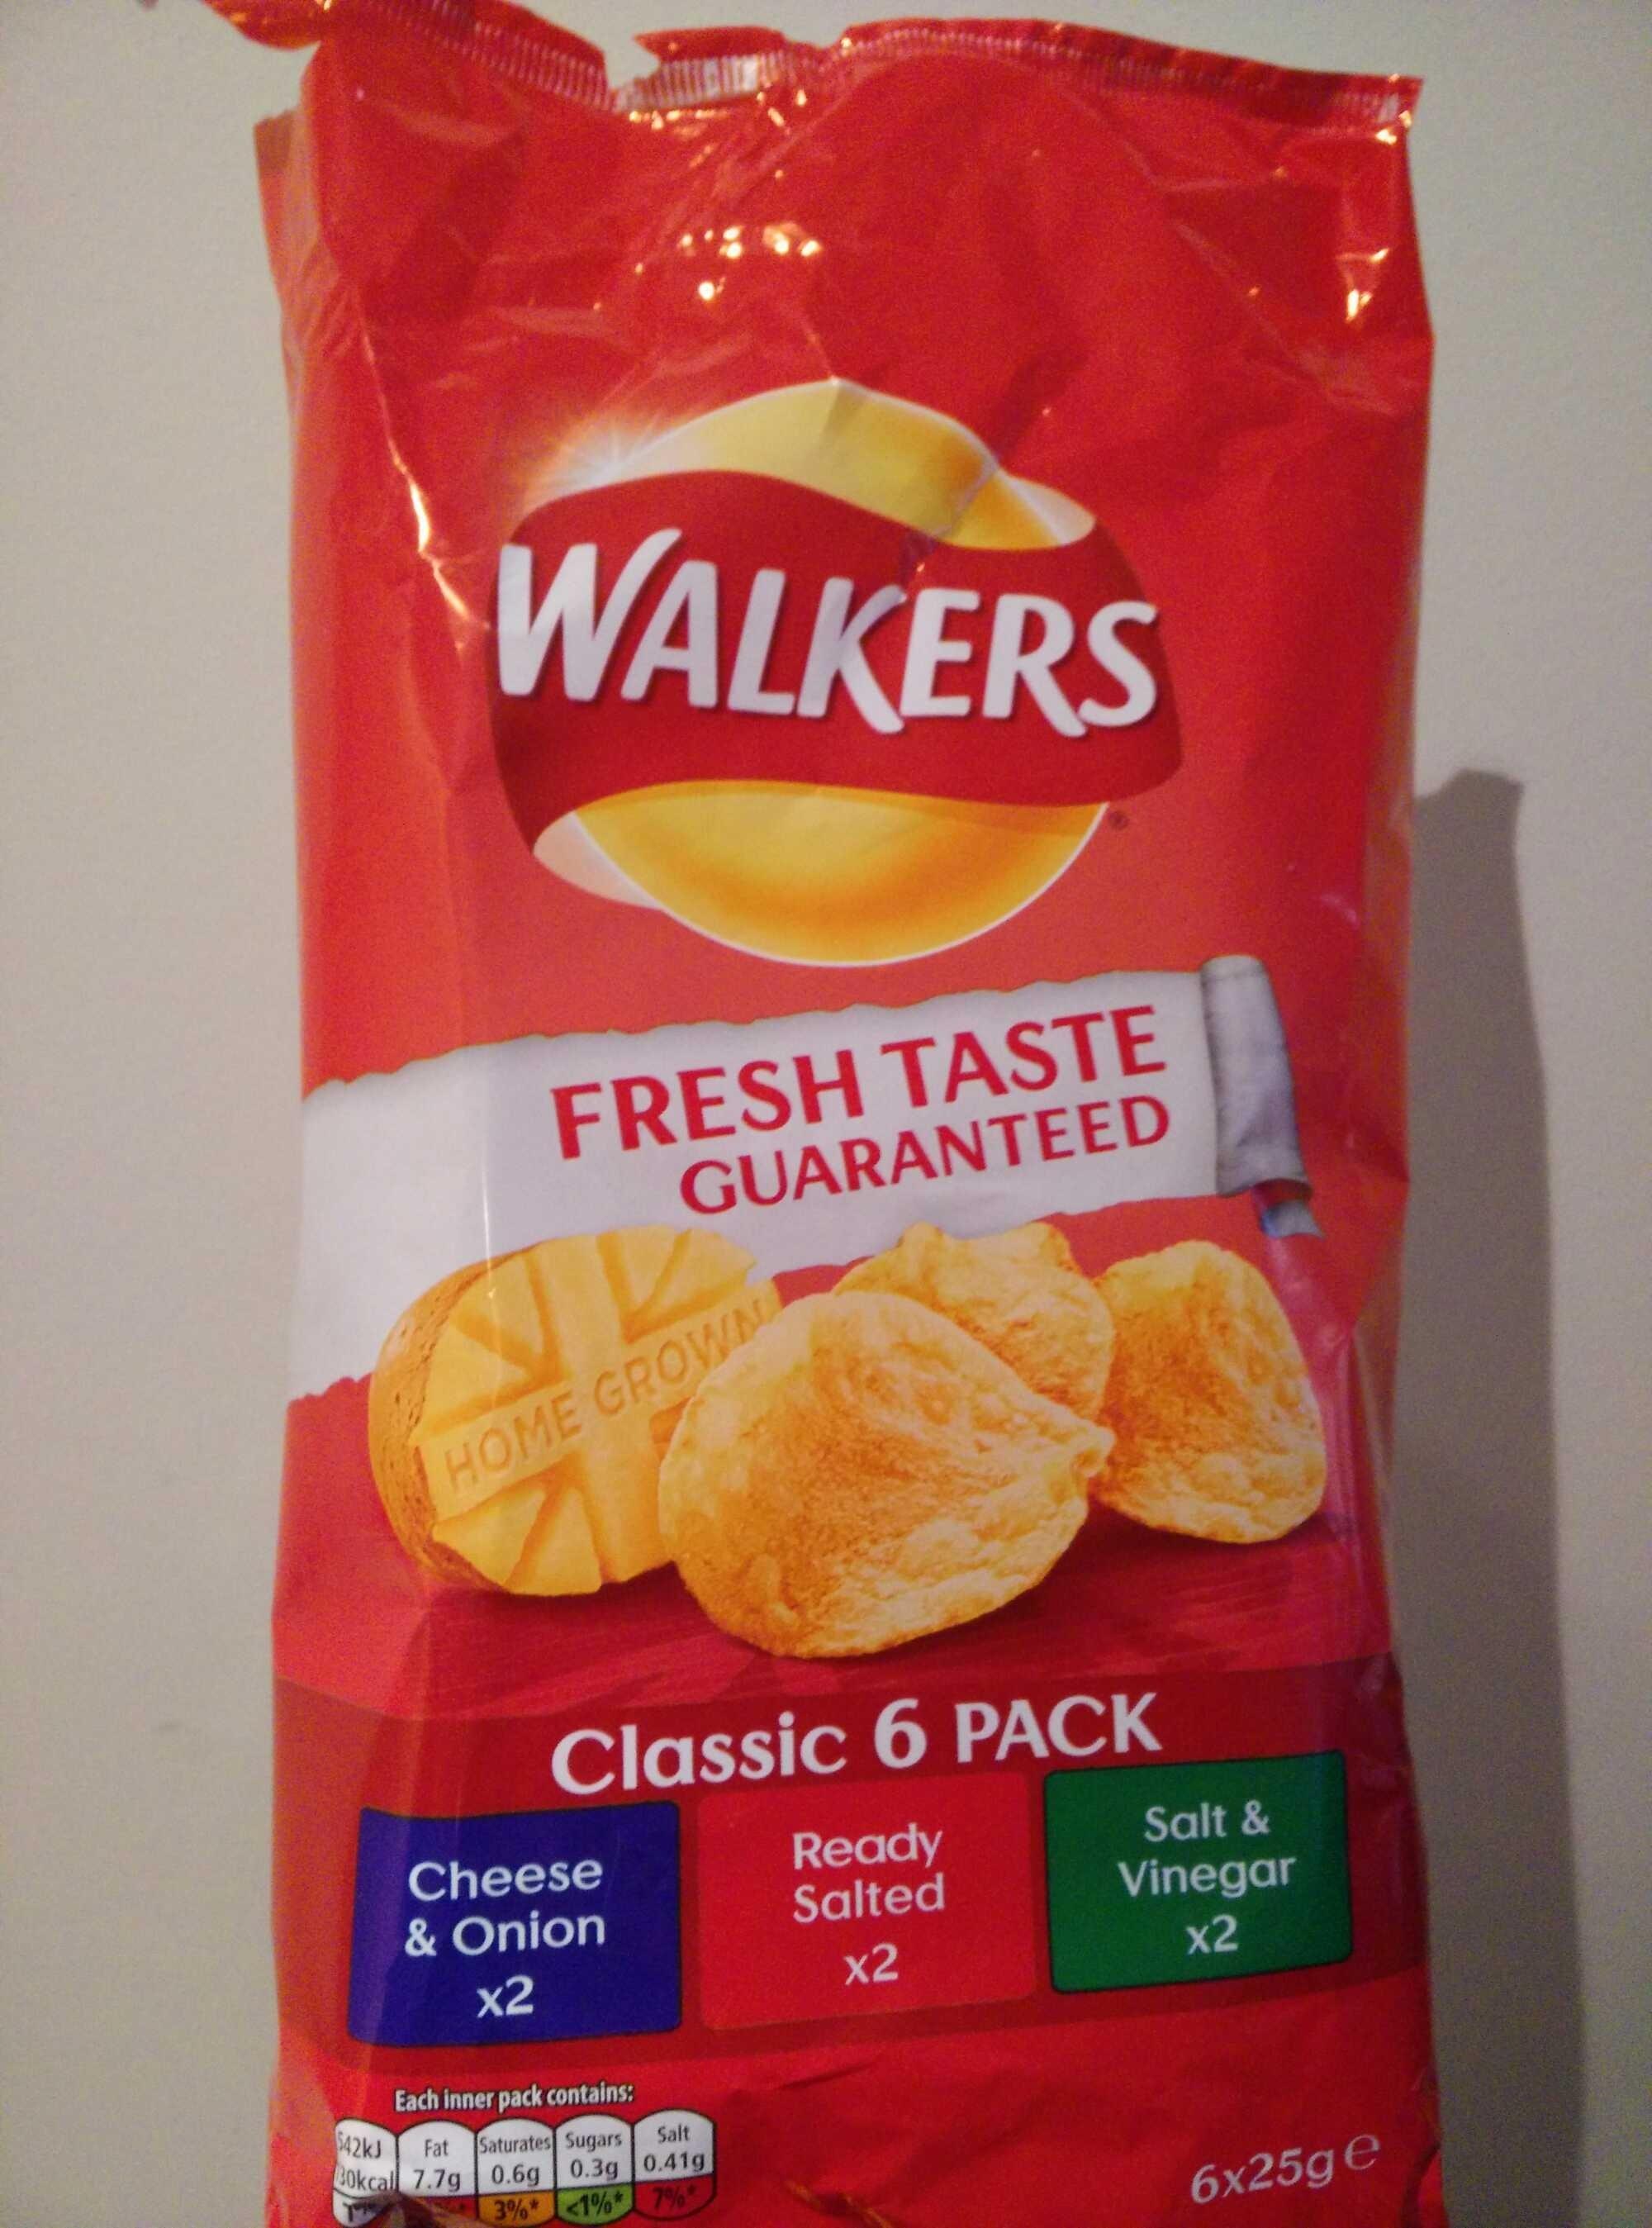 Walkers Variety Crisps 6 X 25 G - Product - en